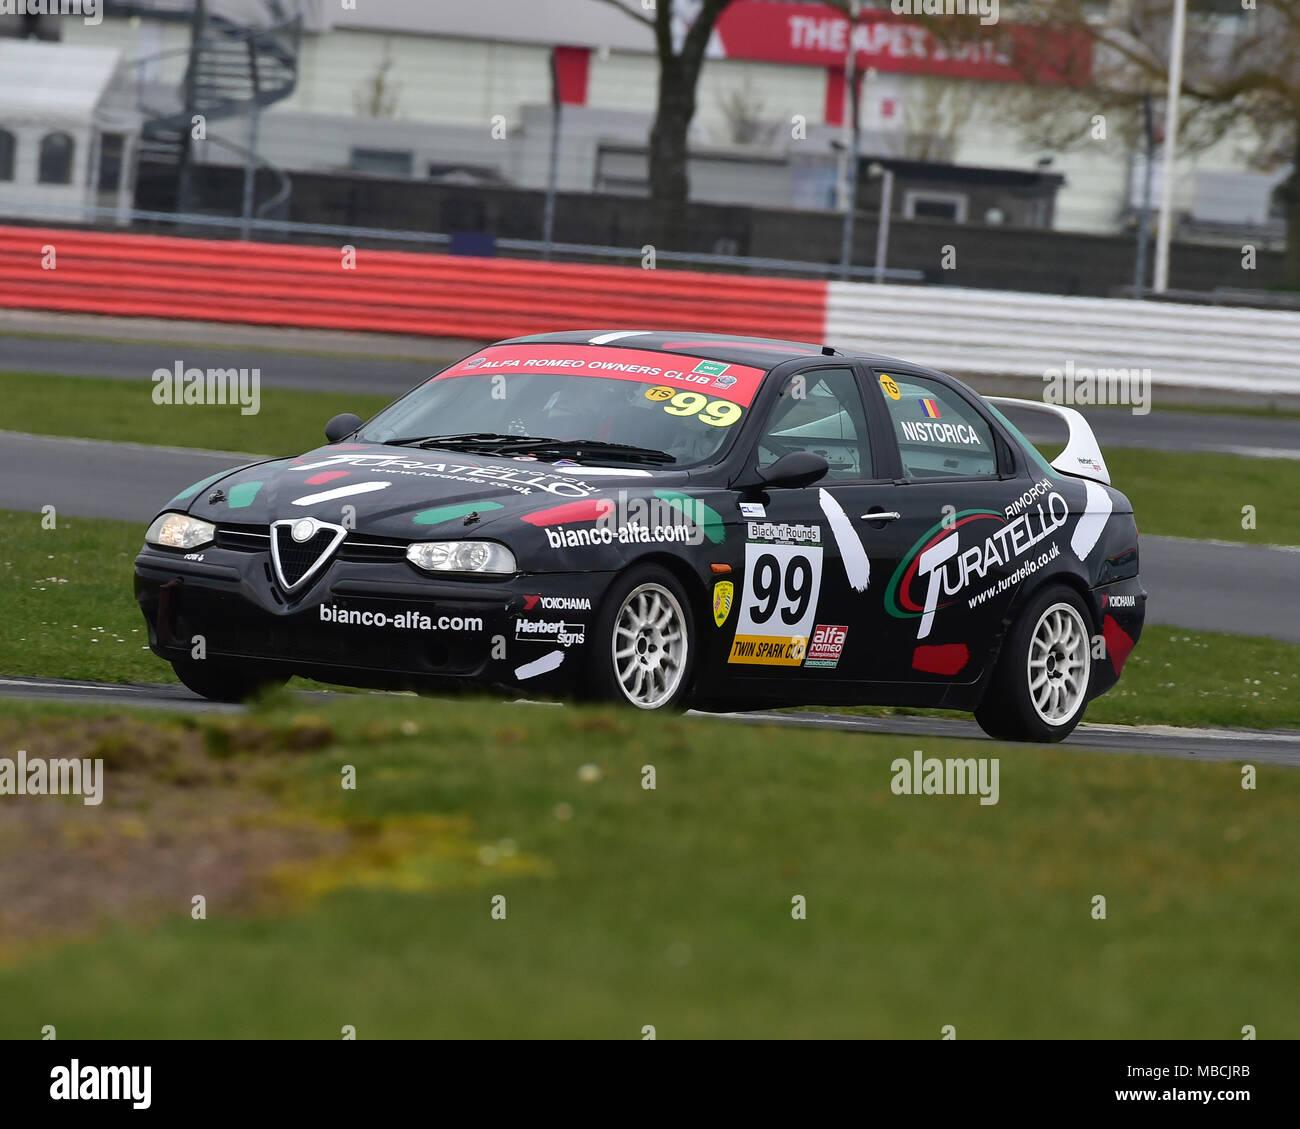 Alfa Romeo 156 Stock Photos & Alfa Romeo 156 Stock Images